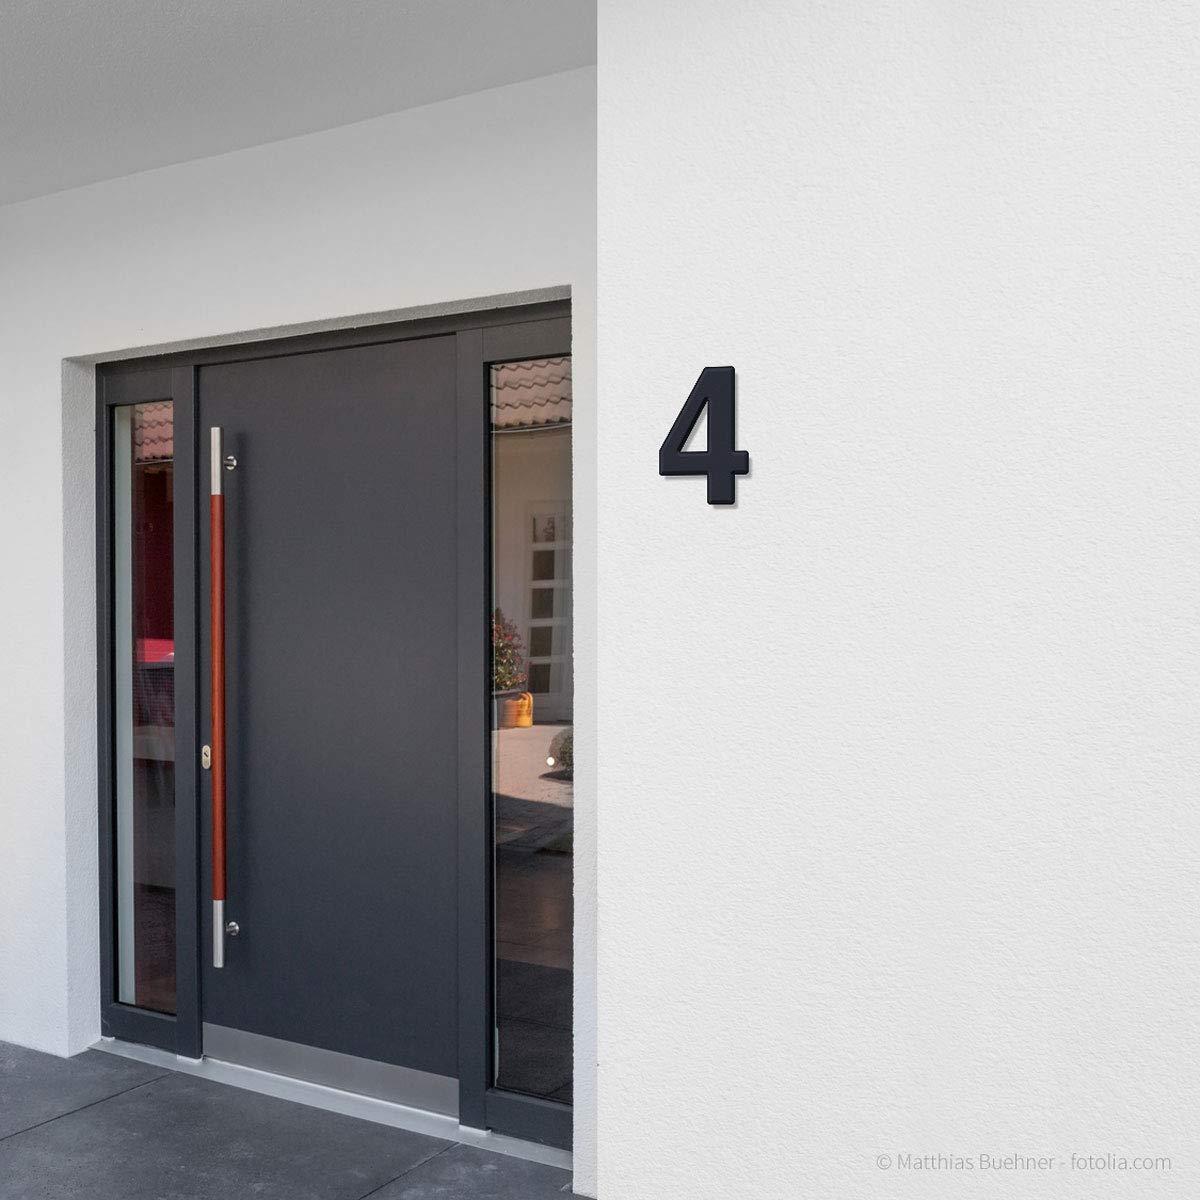 grau 16cm Thorwa/® Design V2A Edelstahl Hausnummer Feinstruktur beschichtet RAL 7016 anthrazit a